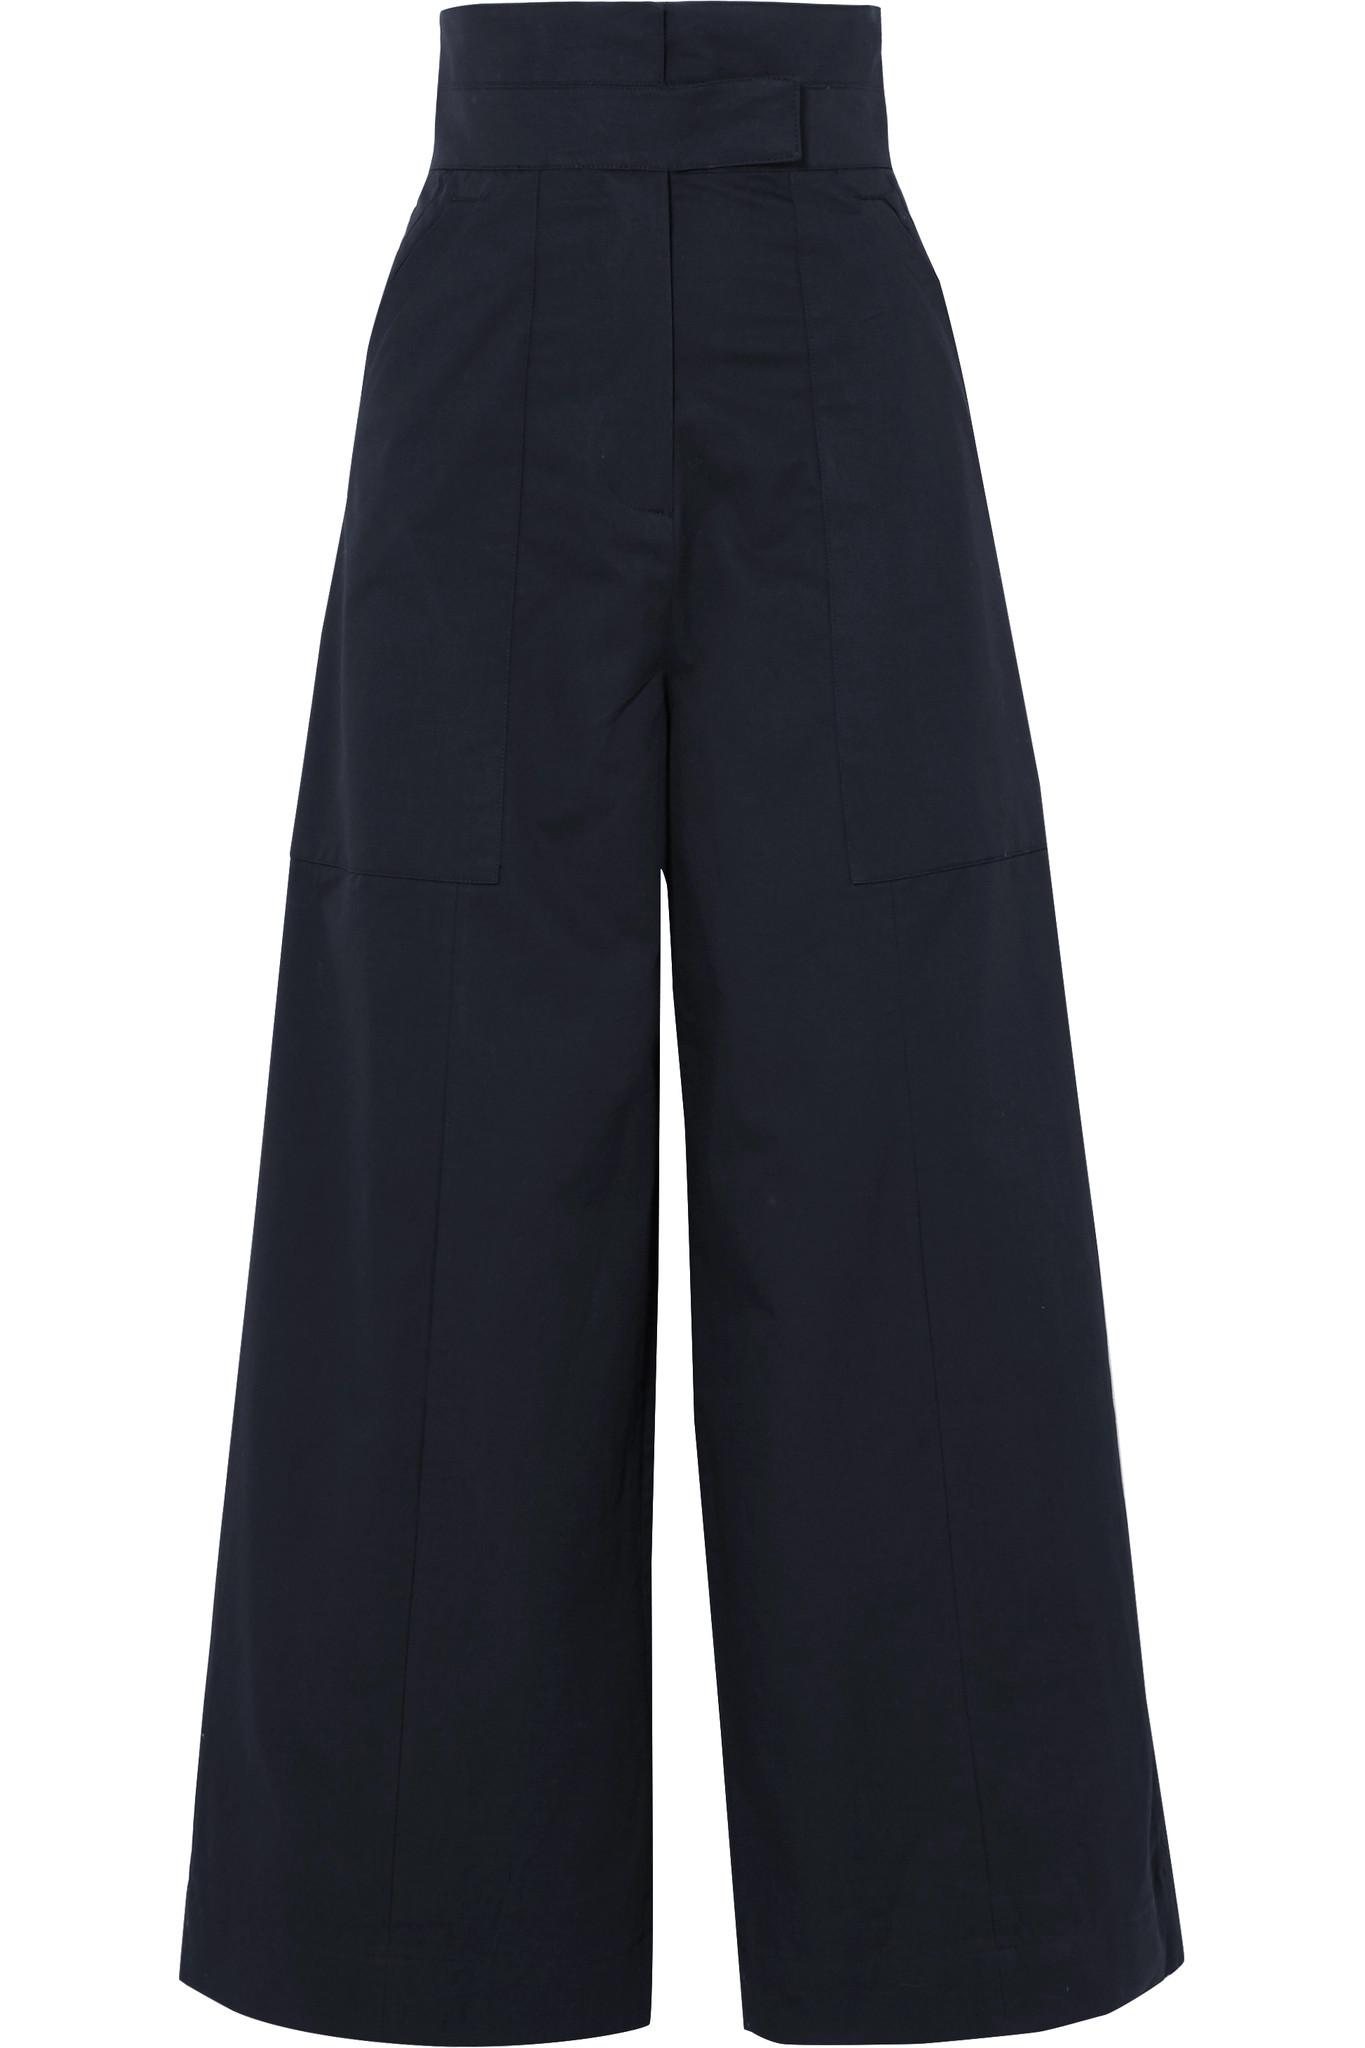 Hestia Cotton-poplin Wide-leg Pants - Navy Solace London i5C2K